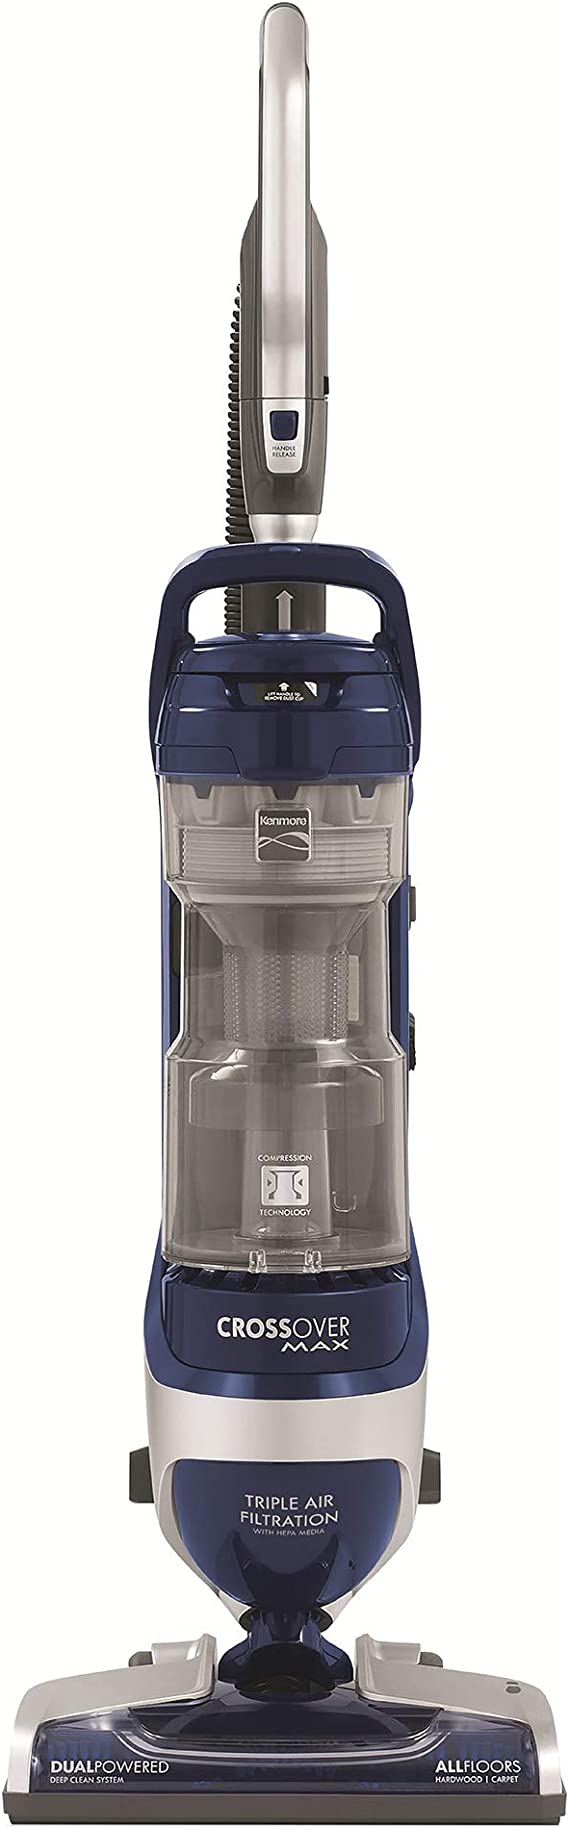 Kenmore Elite 31220  Pet Friendly Bagless Exclusive CrossOver Max Beltless Vacuum with Pet Handi-Mate